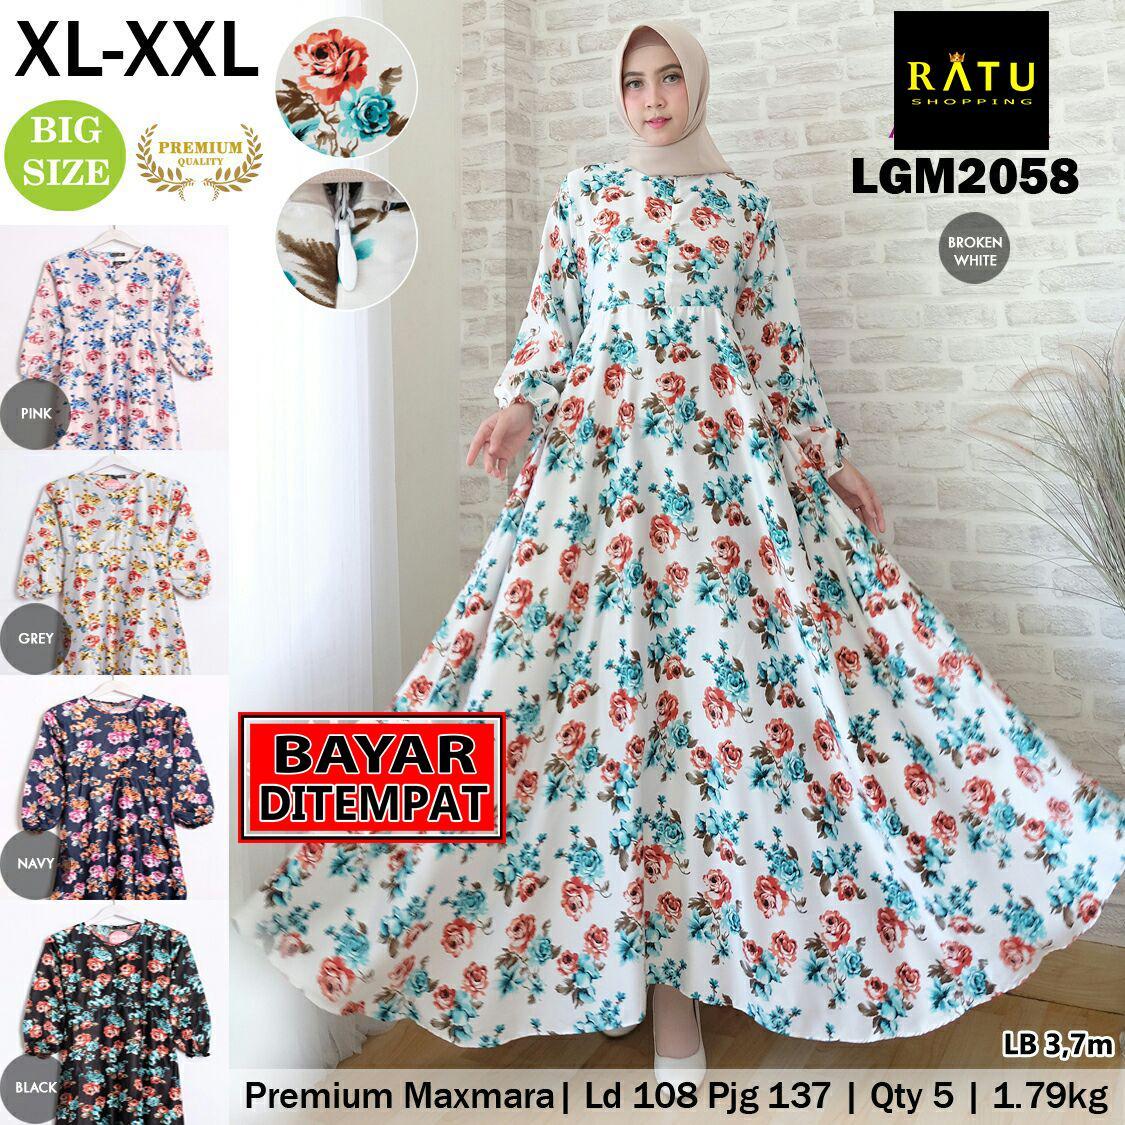 RATU SHOPPING  Gamis premium maxmara xl xxl LGM2058 Jumbo big sze super besar motif bunga baju gamis ramadhan lebaran spesial